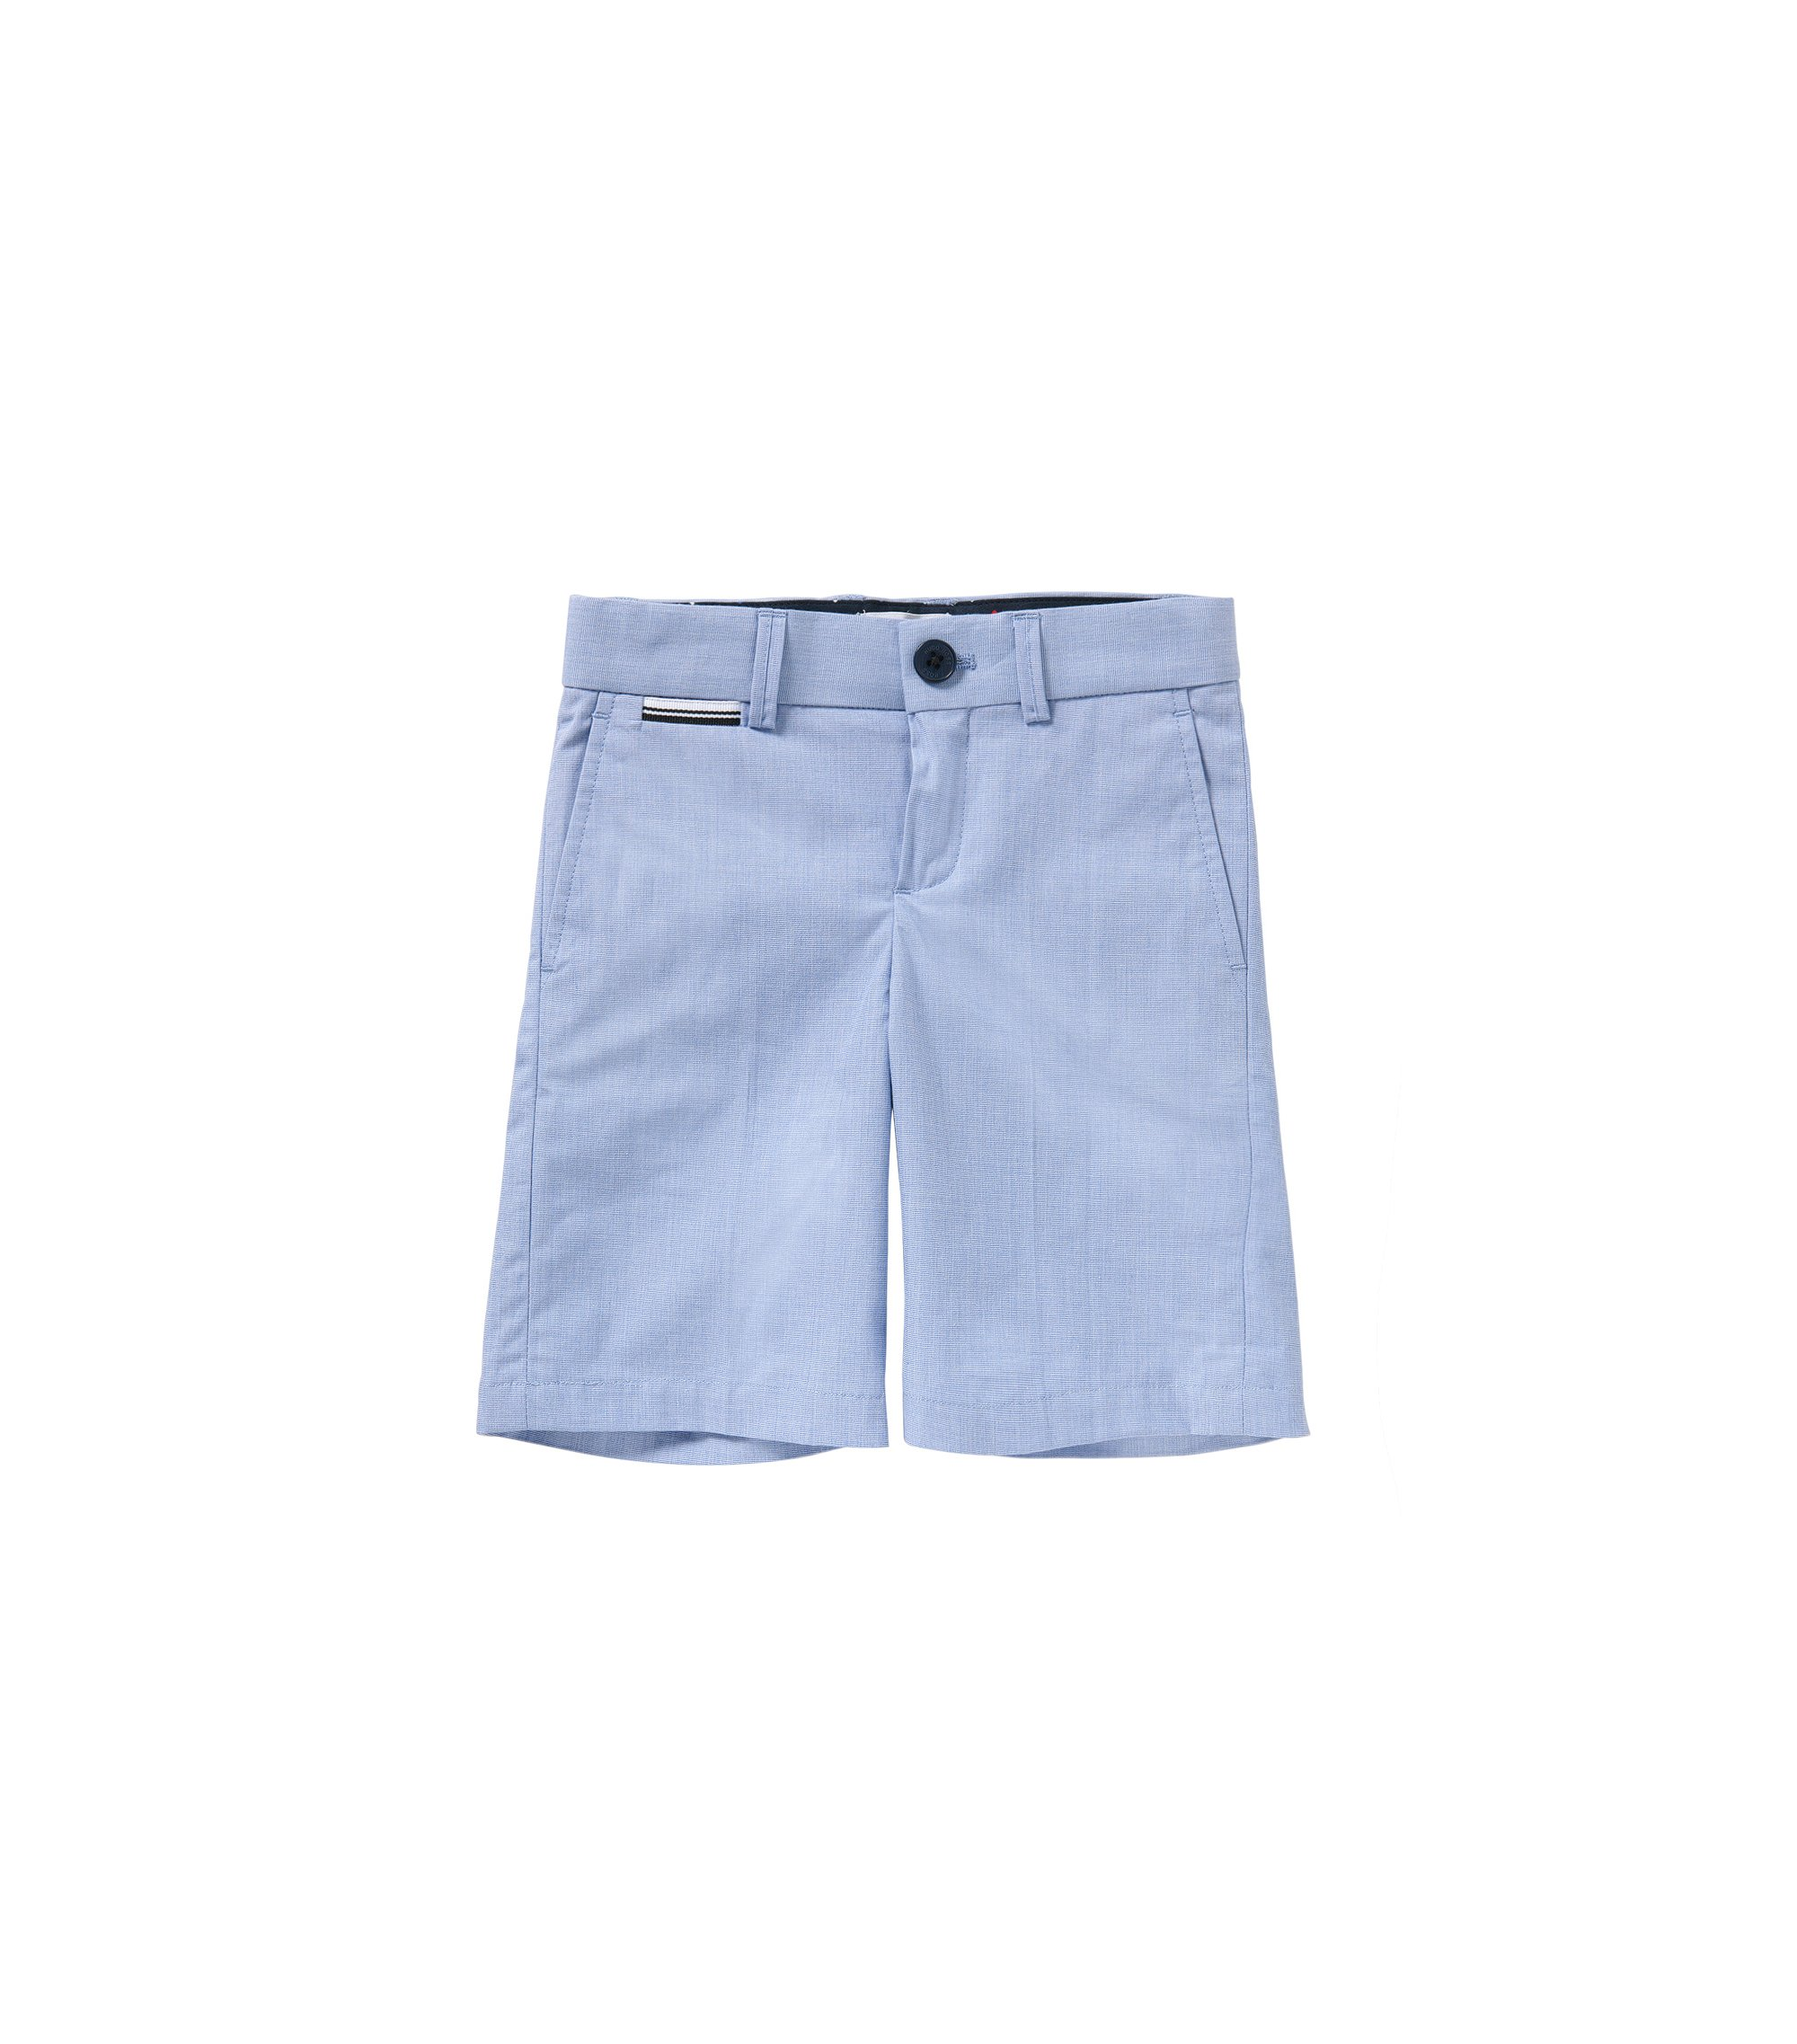 'J24411'   Boys Cotton End-on-End Bermuda Shorts, Light Blue